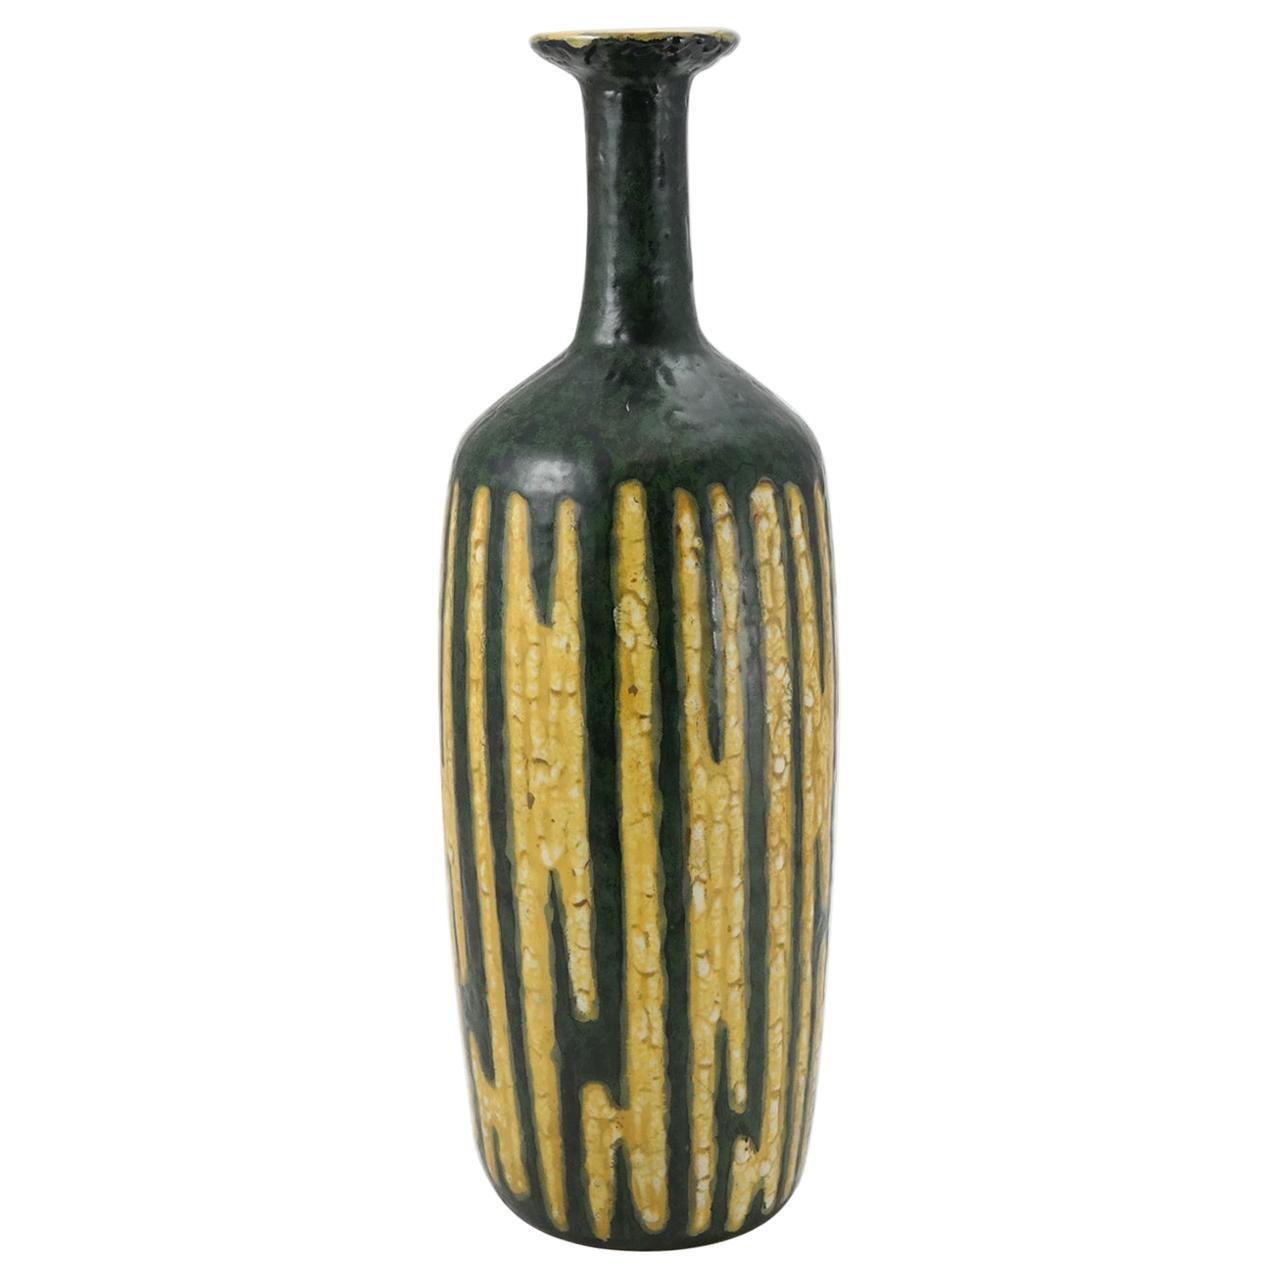 Large Signed Midcentury Ceramic Vase by Illes, 1970s